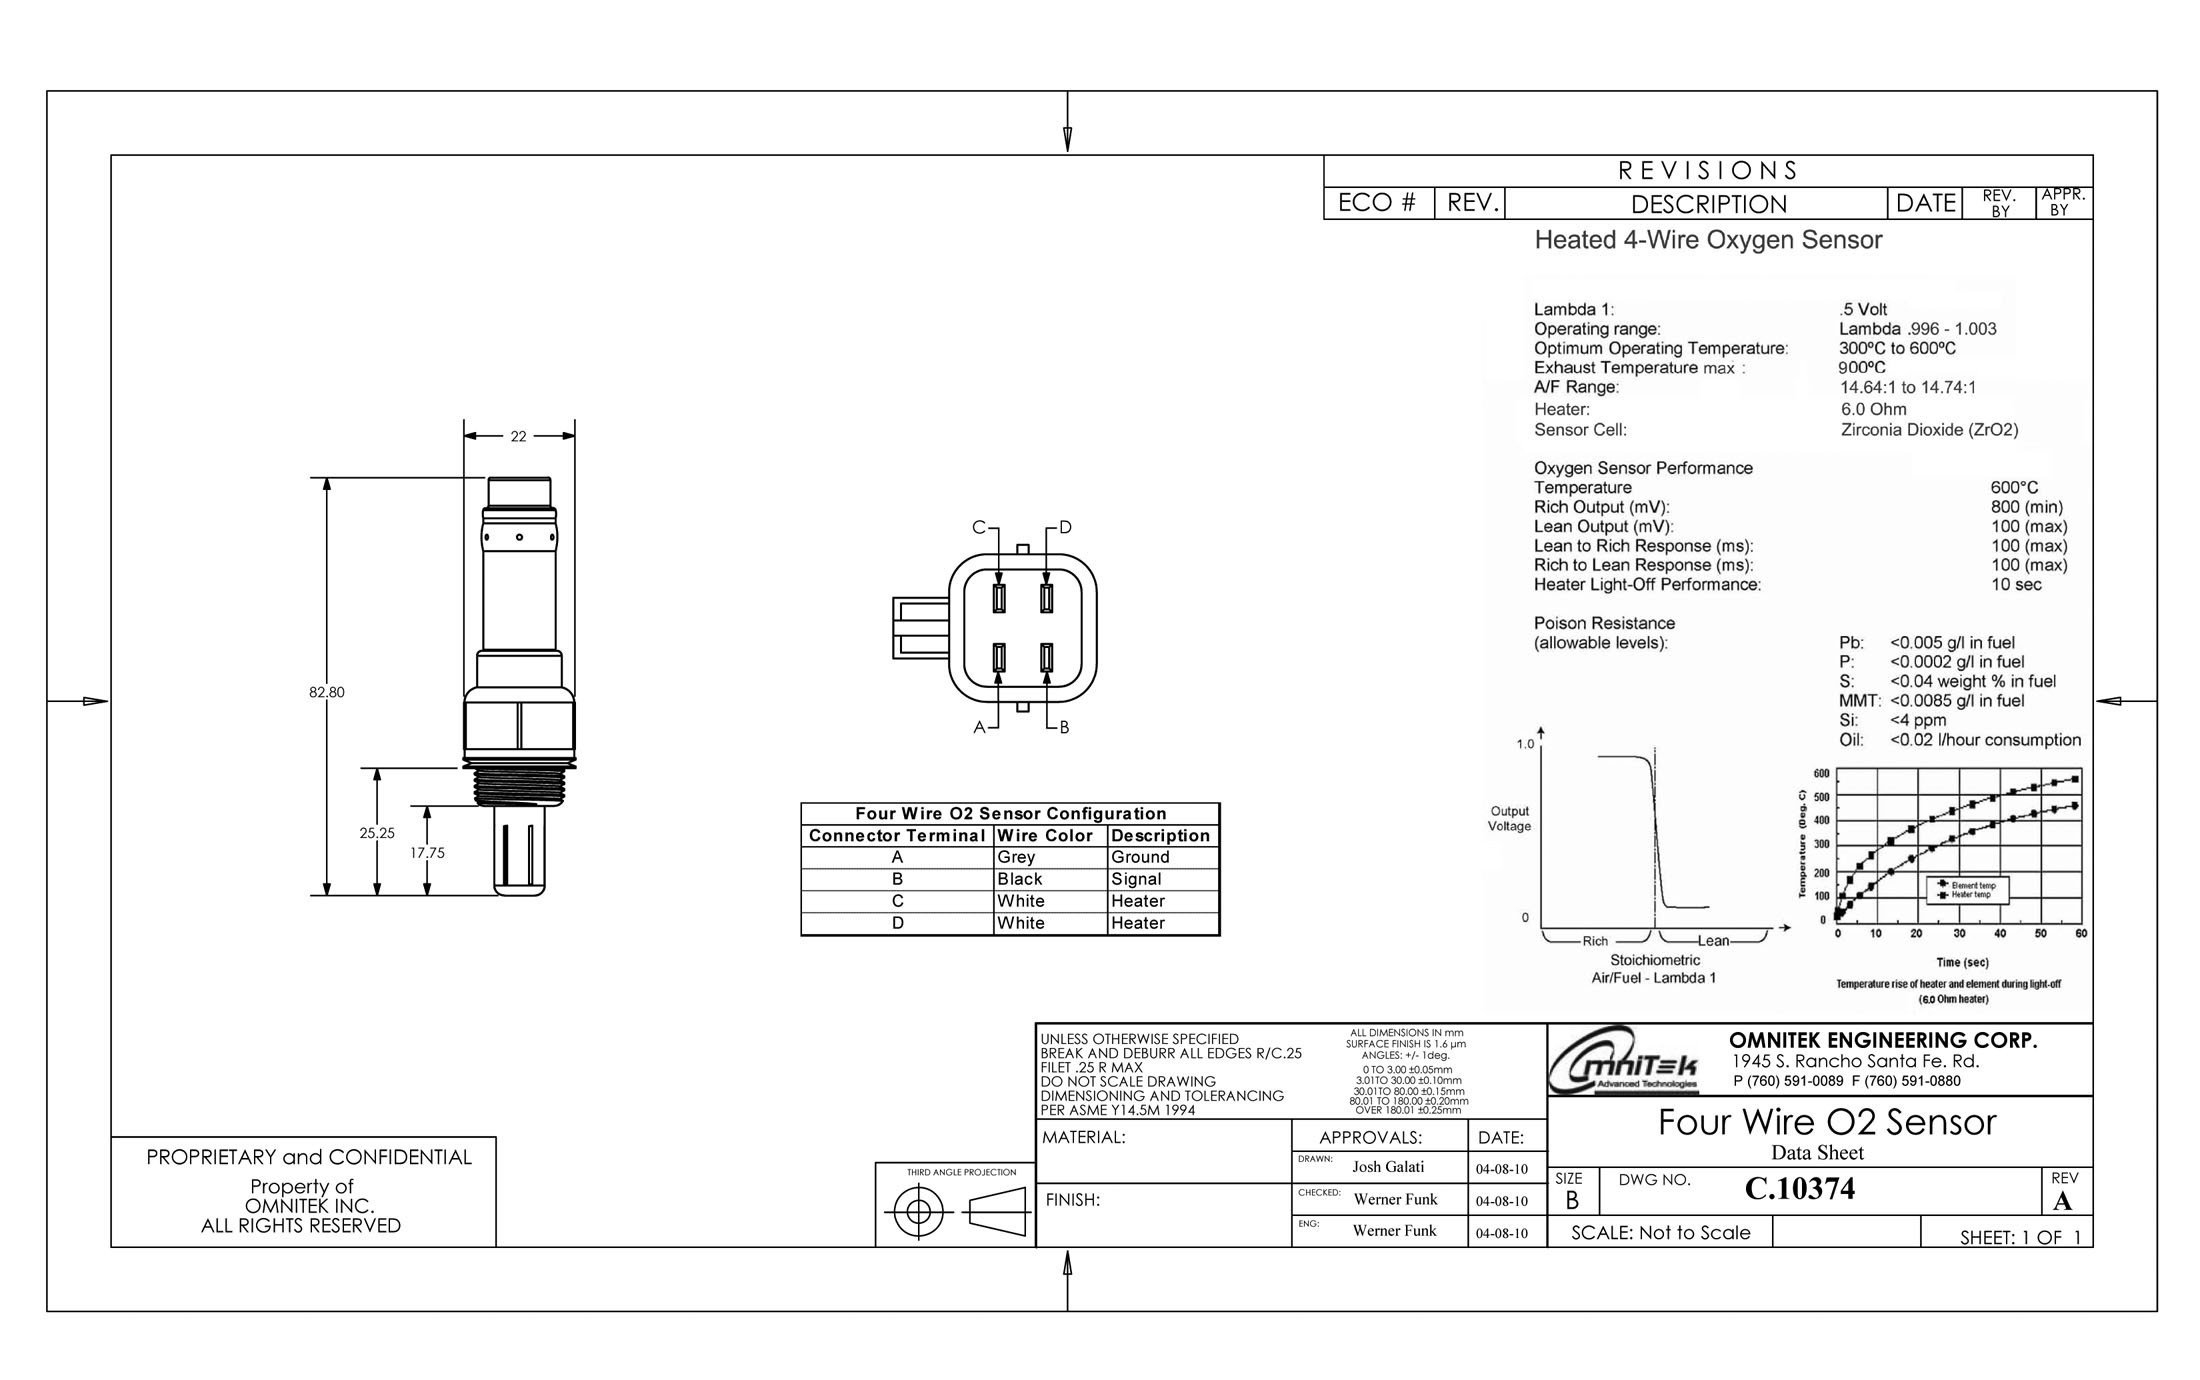 [DIAGRAM] Bosch 4 Wire 02 Sensor Diagram FULL Version HD